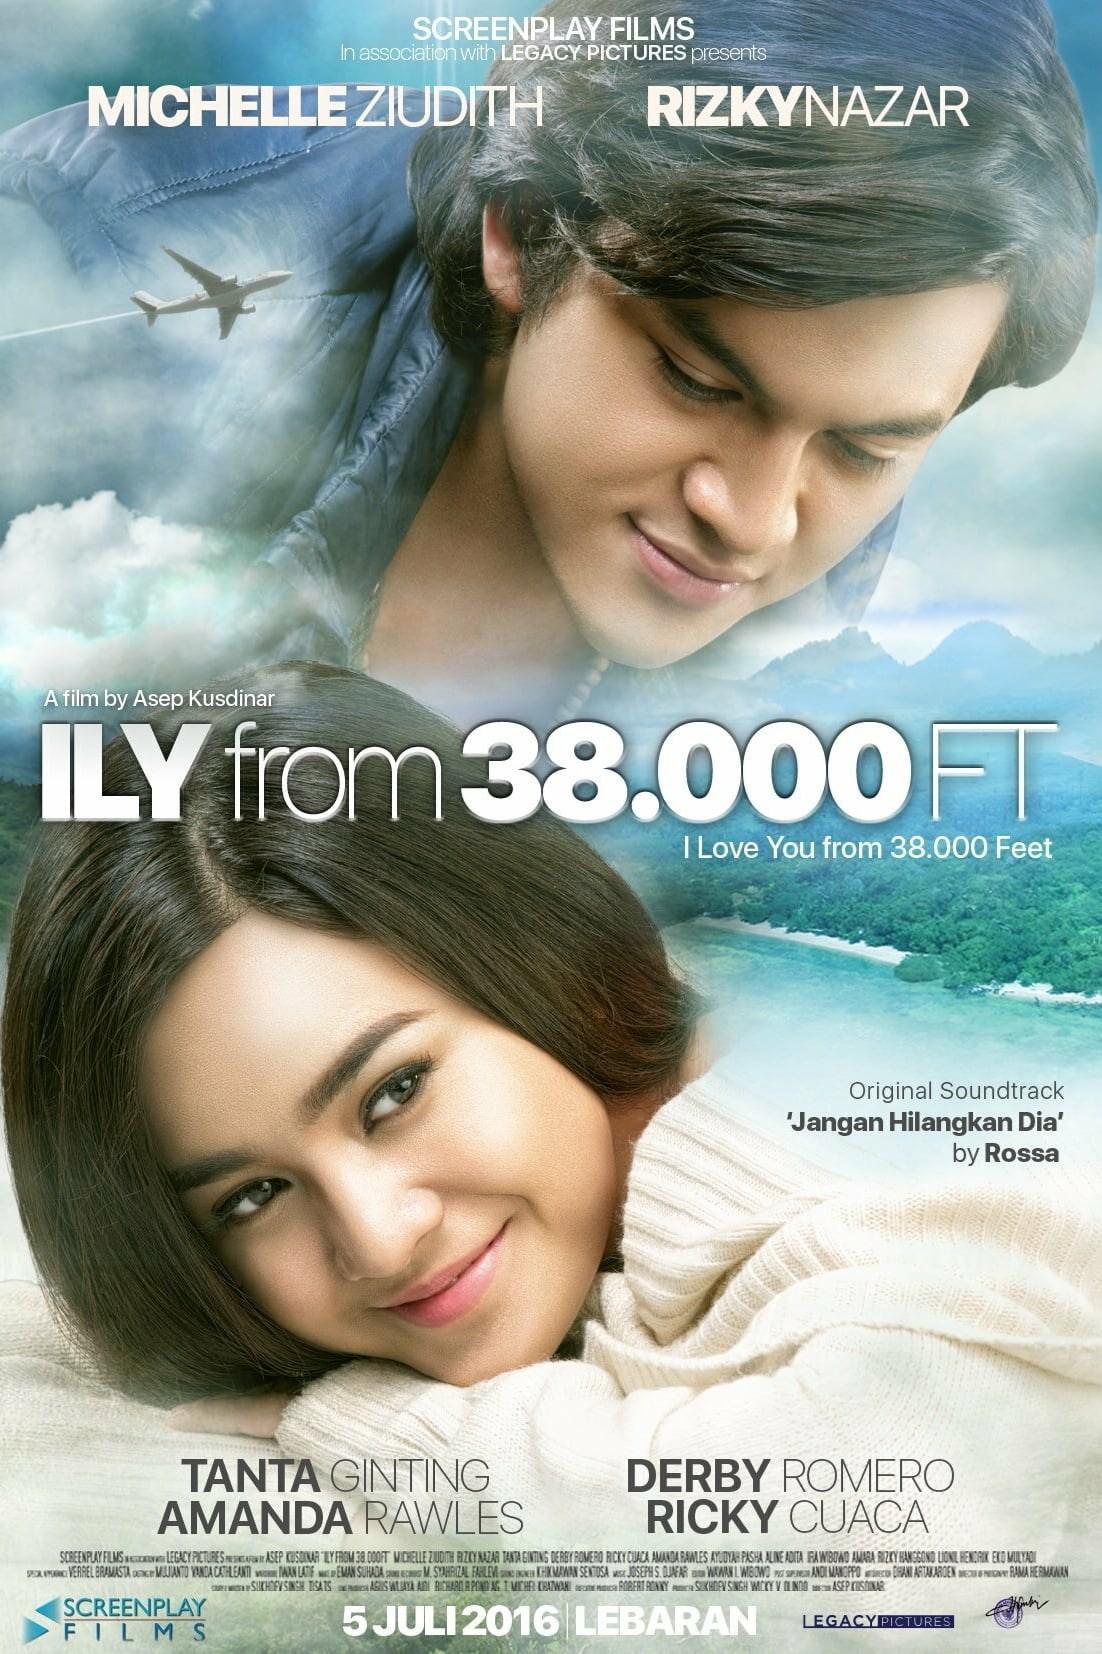 Subscene - I Love You from 38000 Feet Bengali subtitle